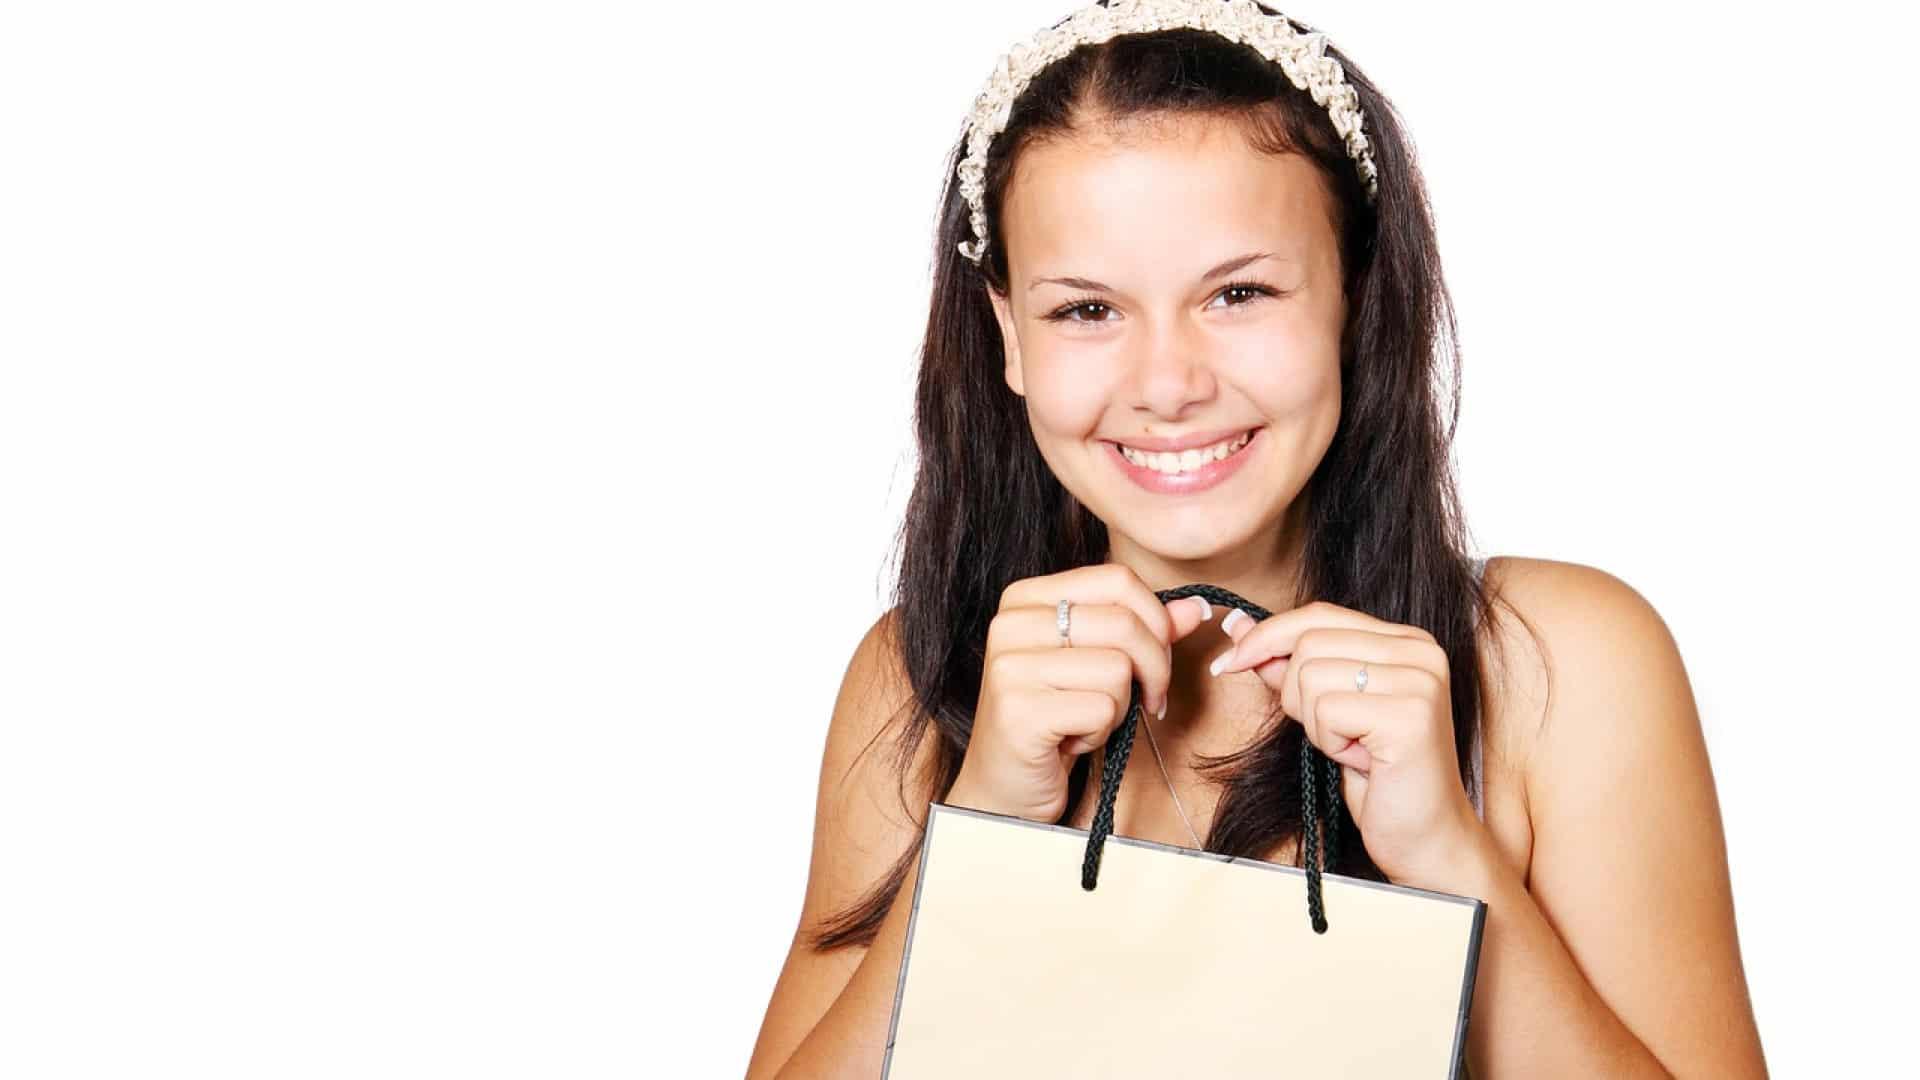 Pourquoi logoter votre sac kraft?